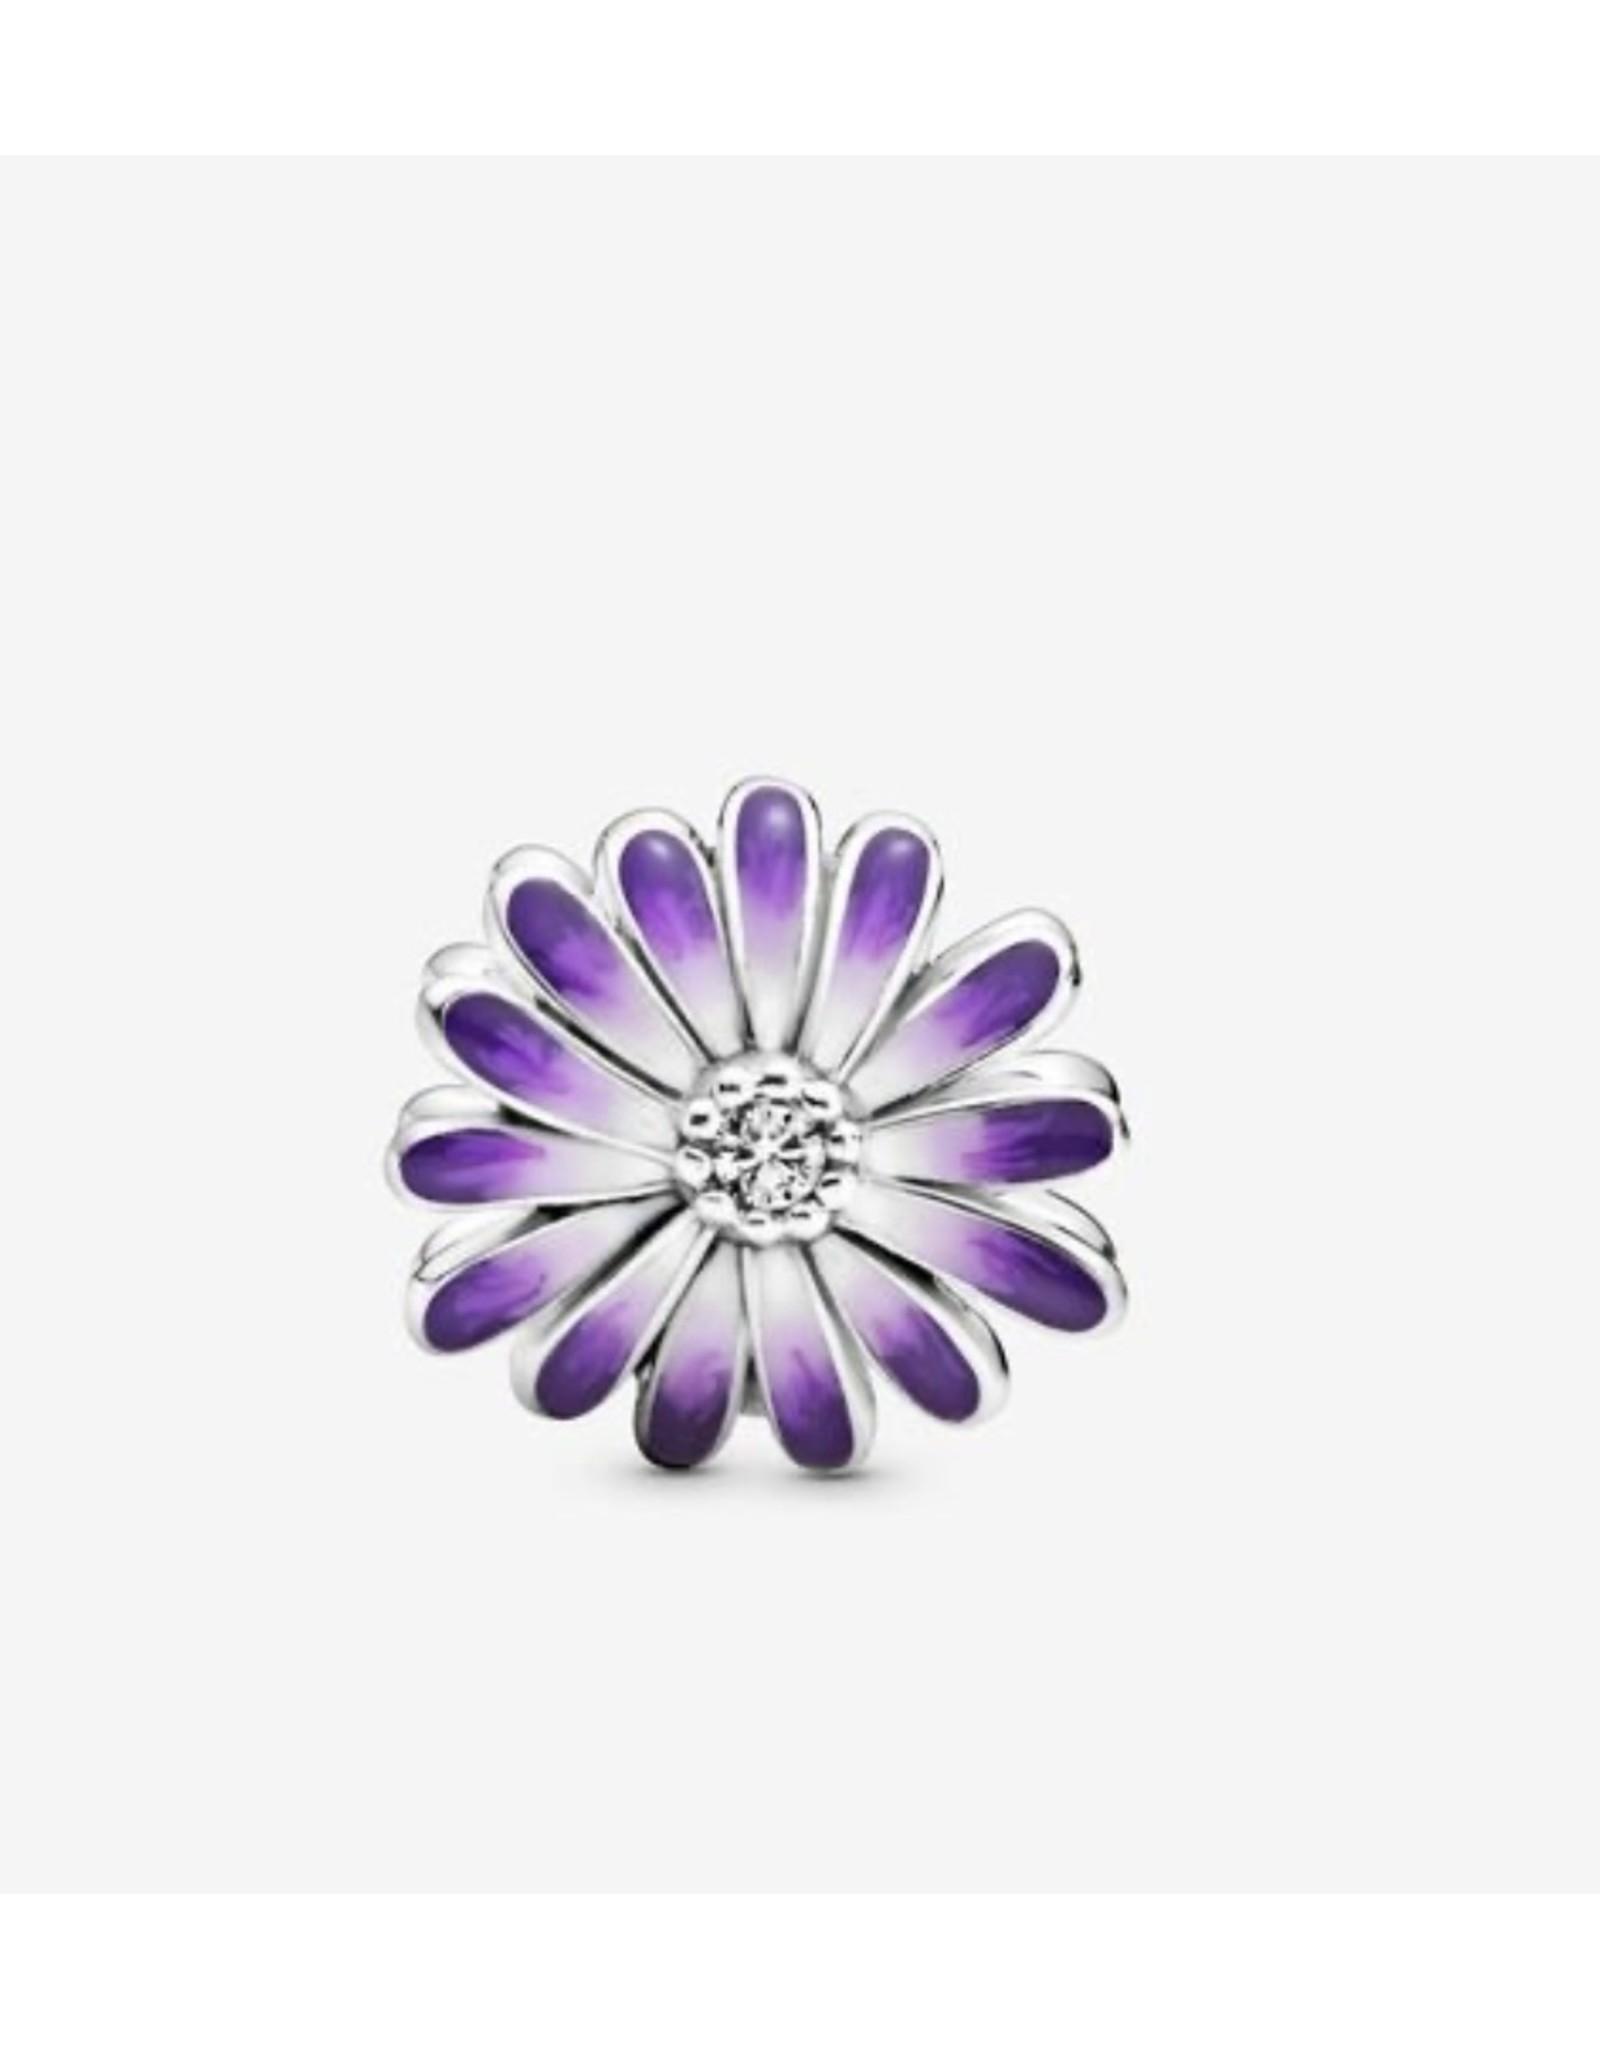 Pandora Pandora Charm, 798775C02, Purple Daisy, Mixed Enamel & Clear CZ